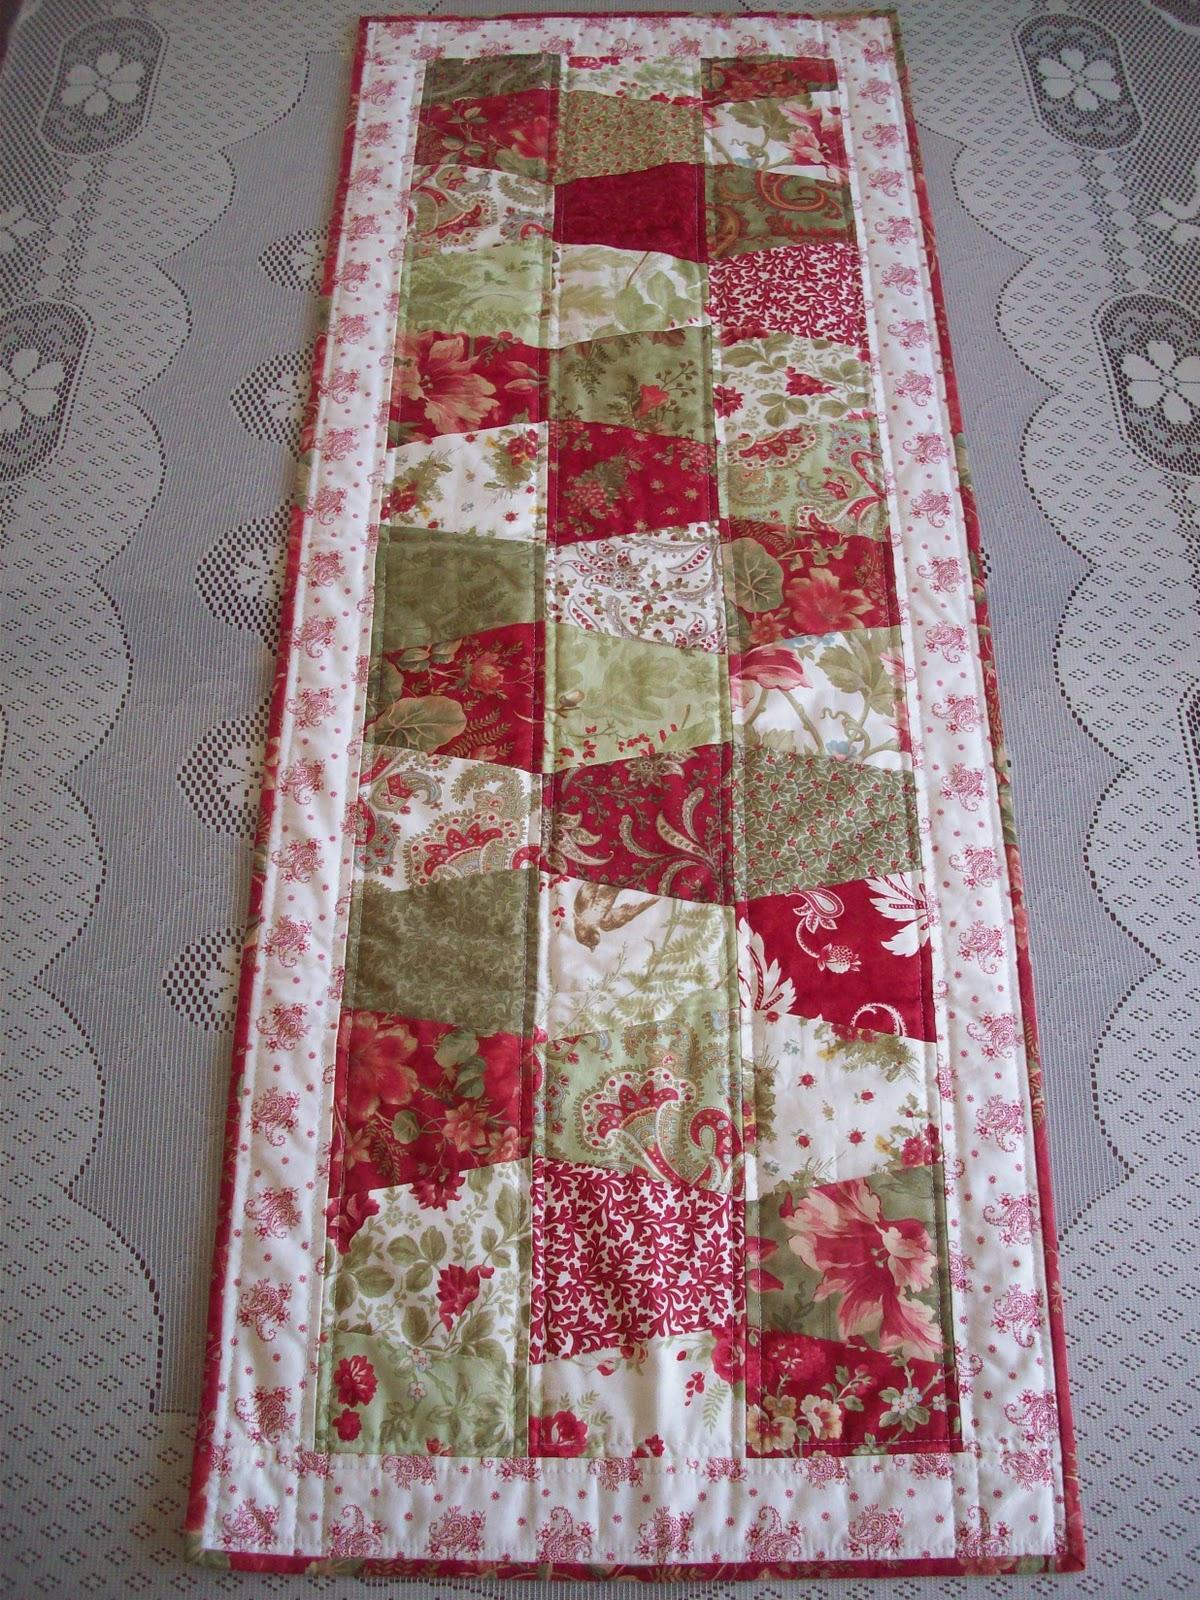 auntie 39 s quaint quilts christmas tablerunner. Black Bedroom Furniture Sets. Home Design Ideas